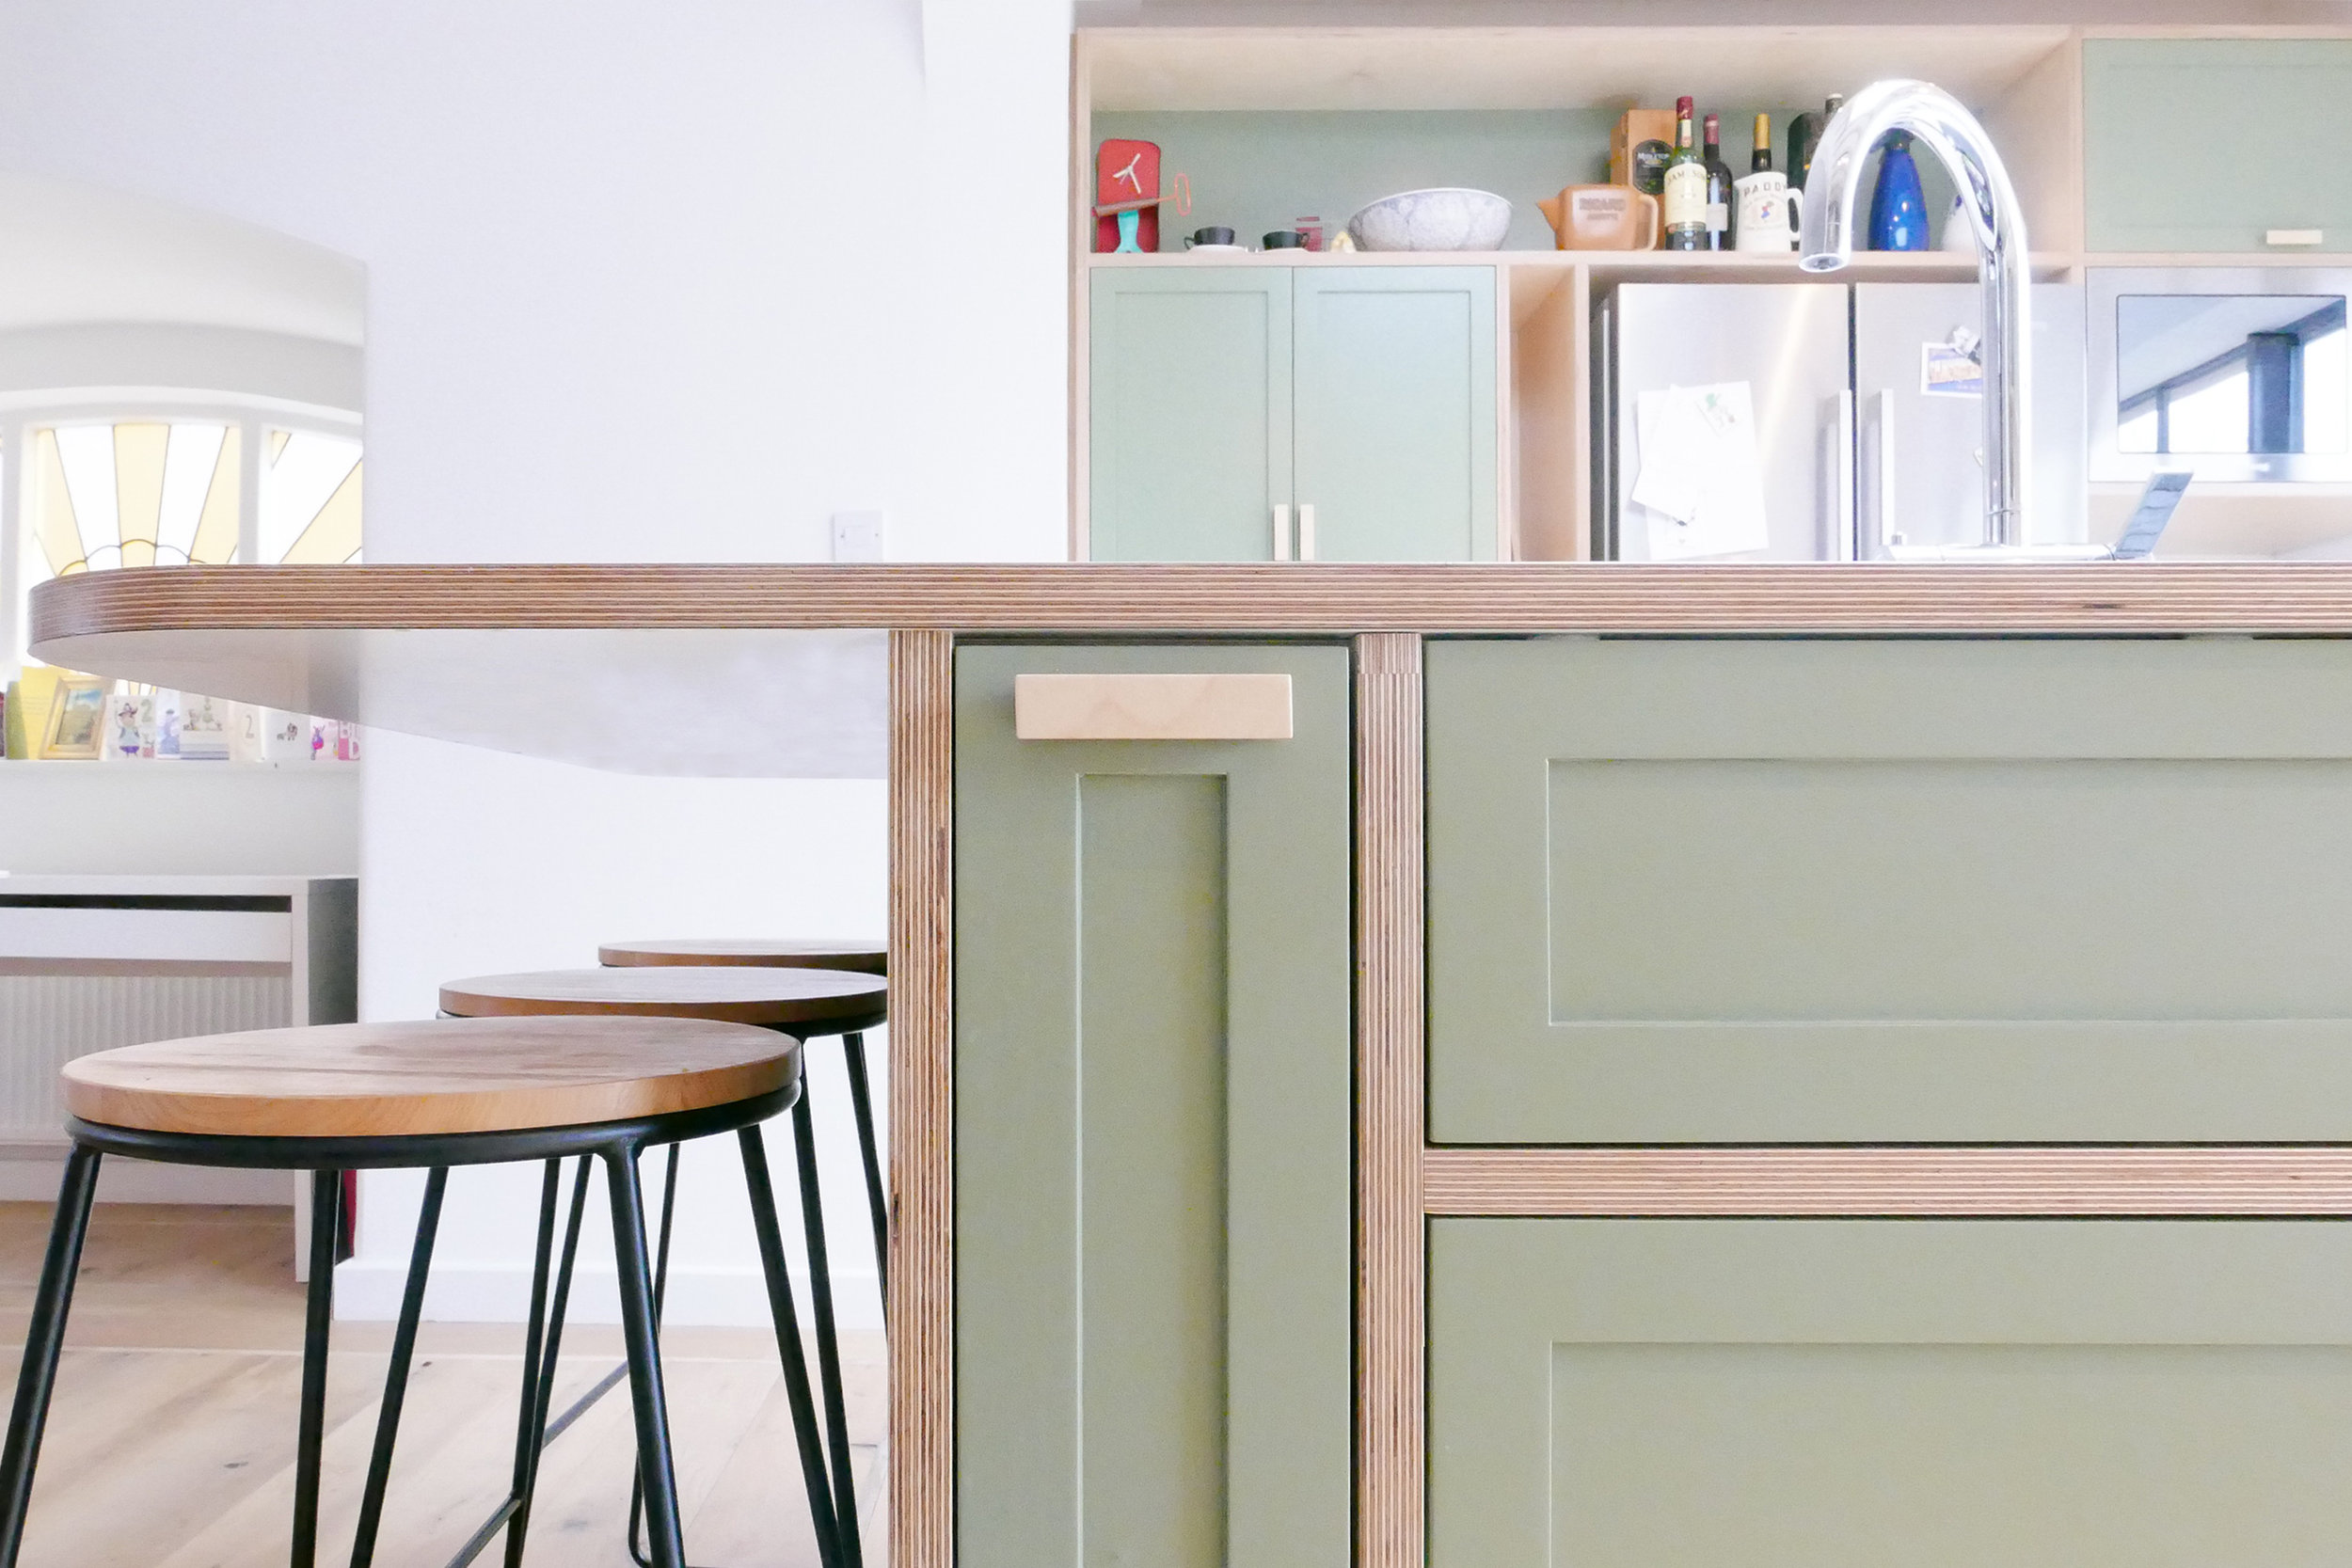 Bespoke Kitchen Design Upper Walthamstow E17